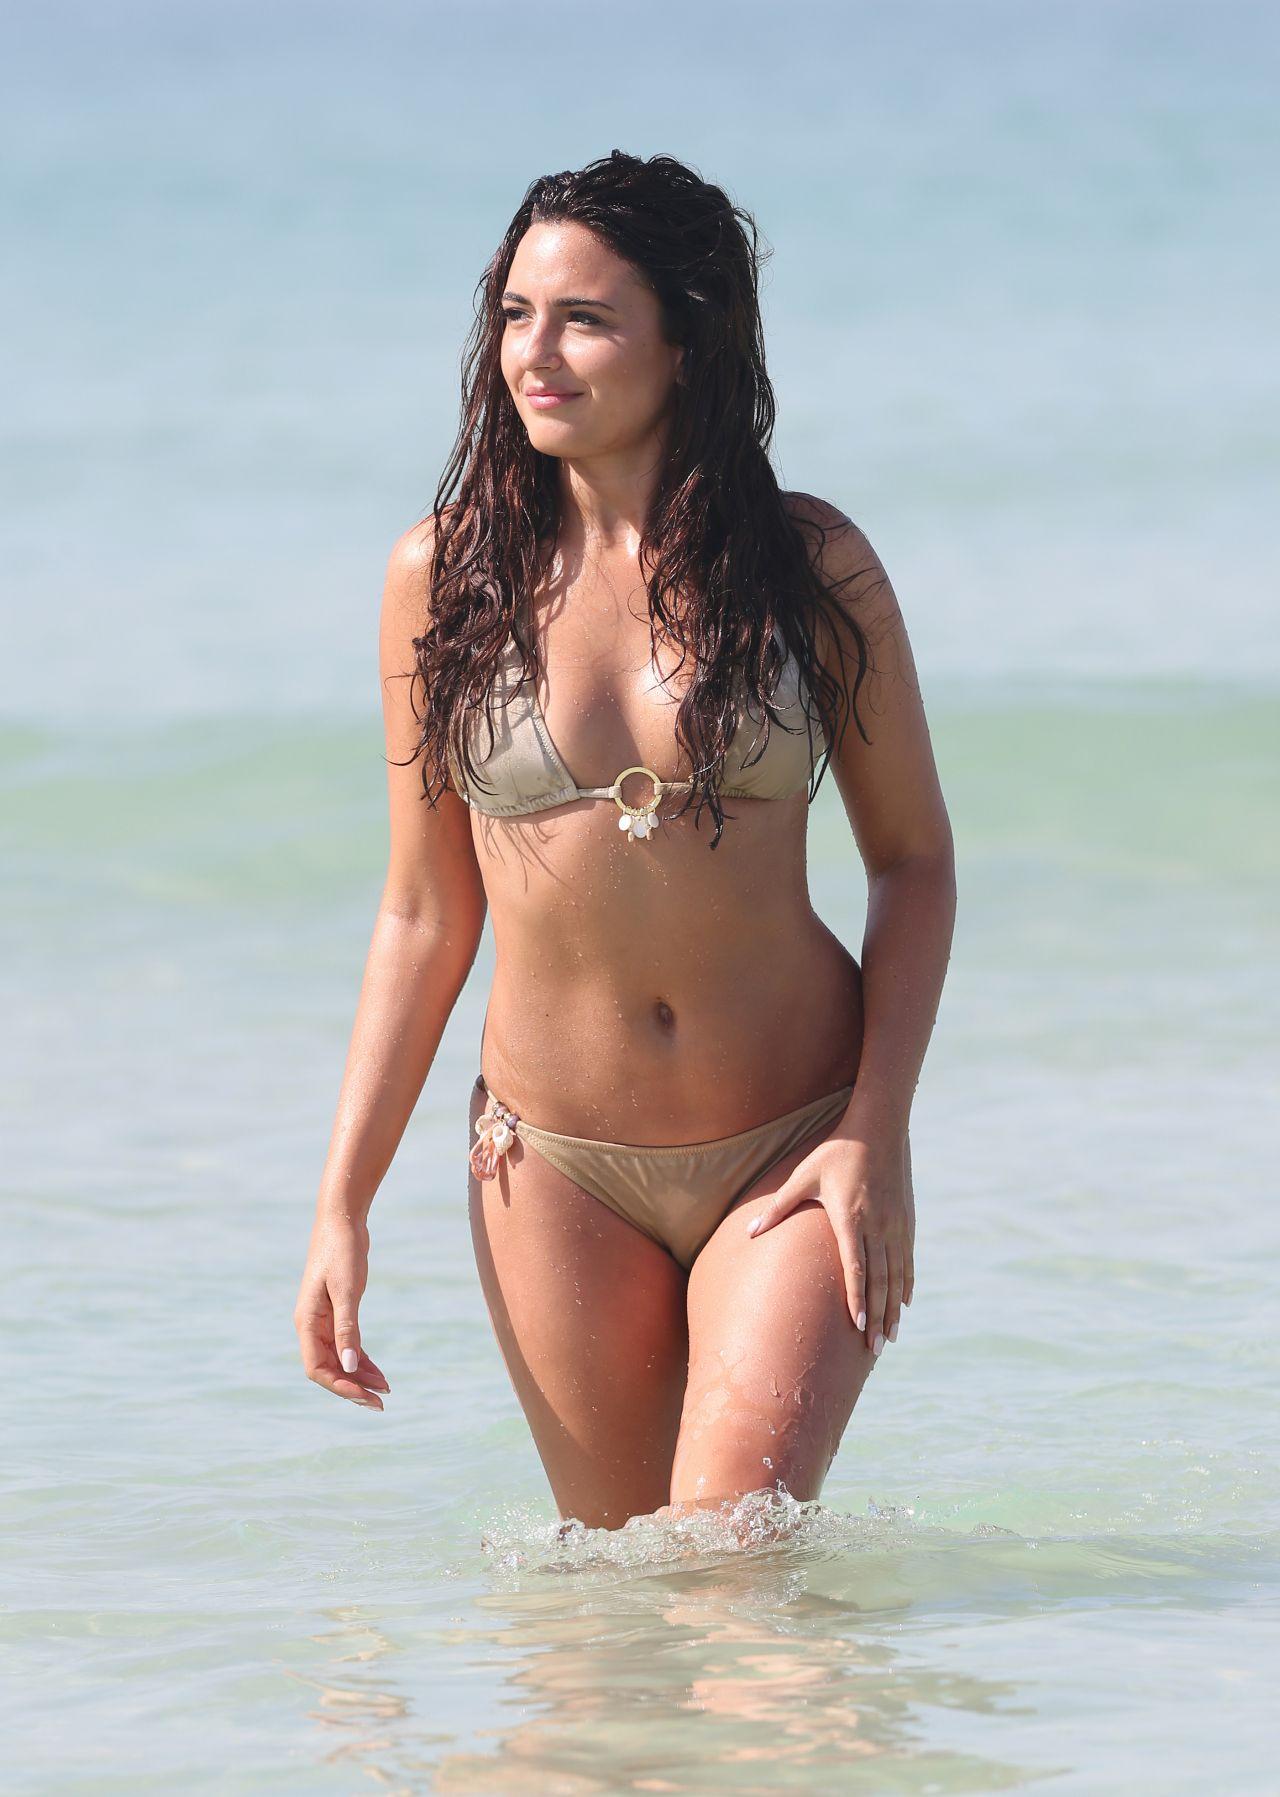 Nadia Forde Bikini Pics - Dubai, January 2015